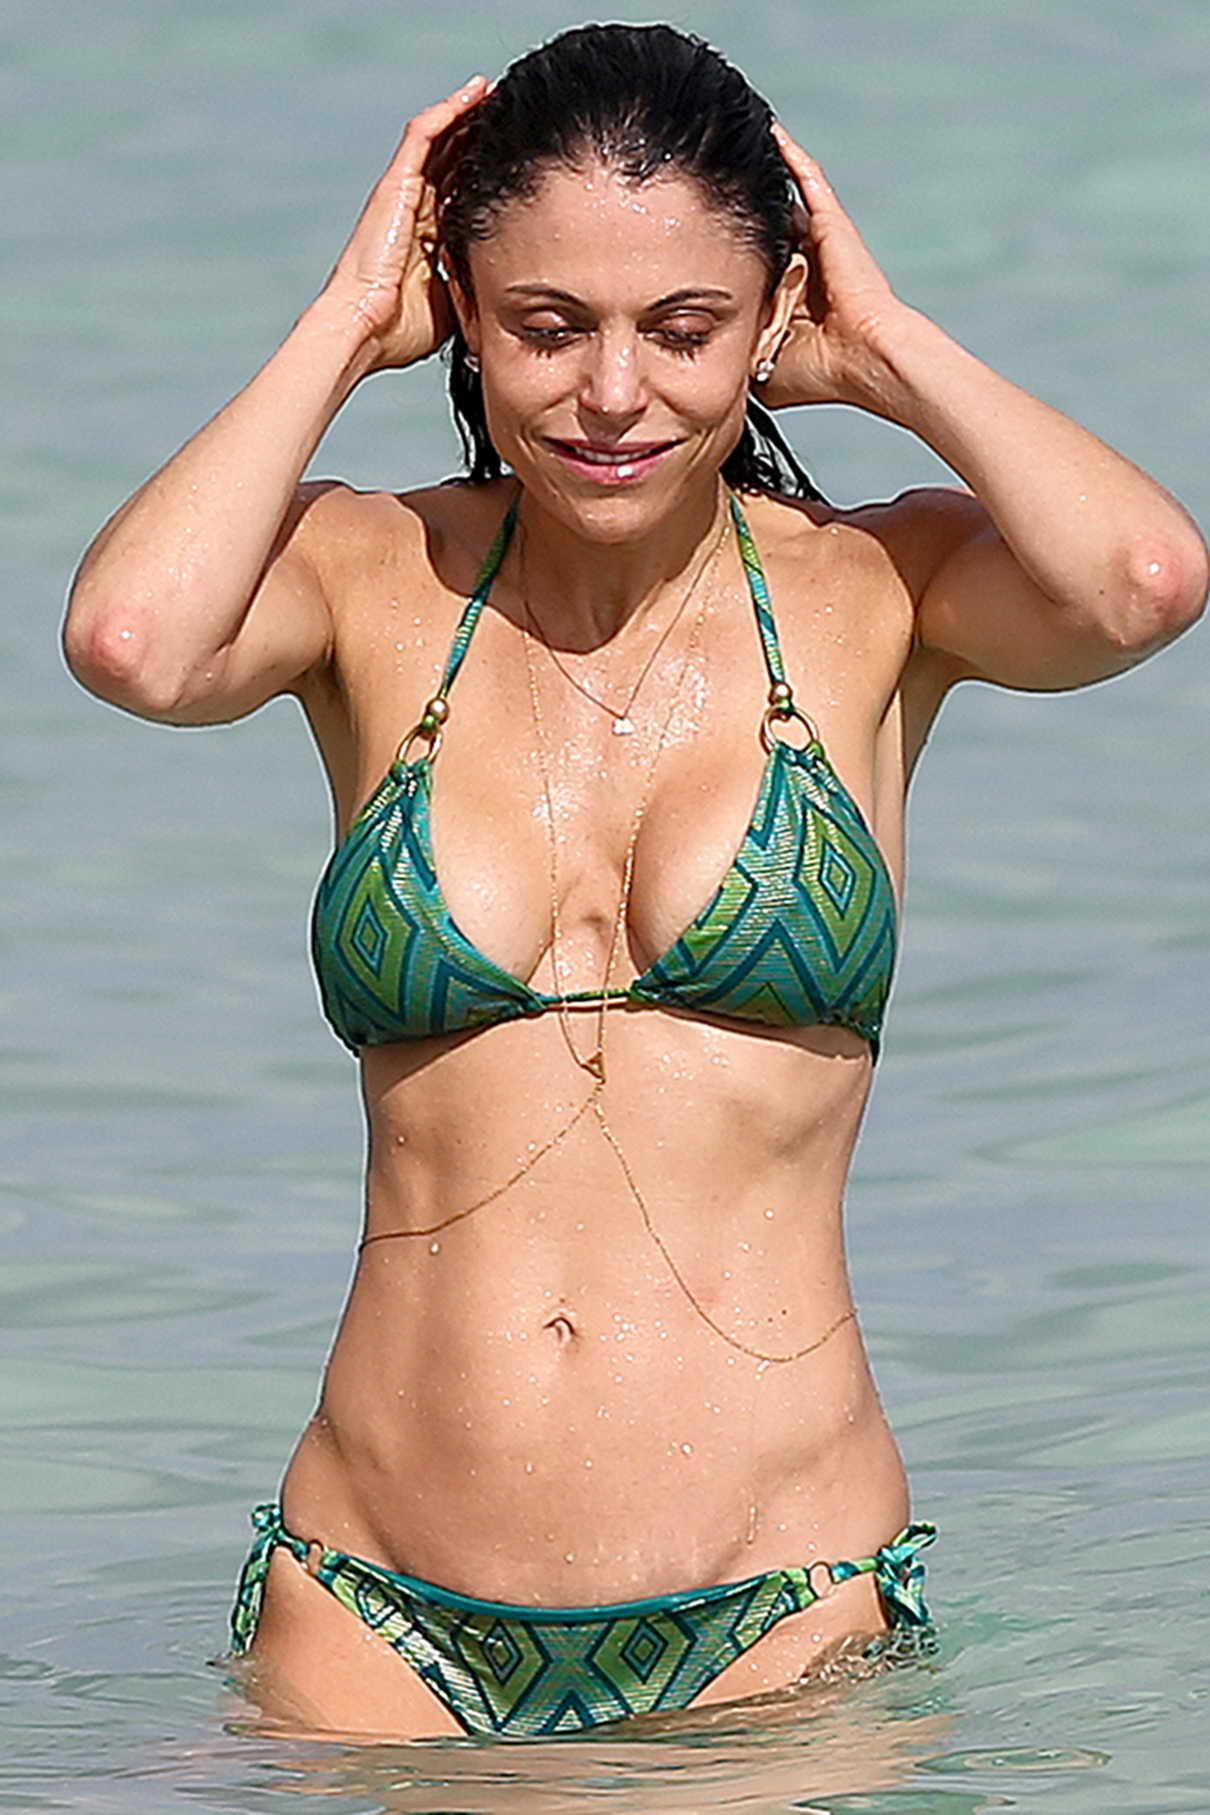 Kelly rowland green bikini